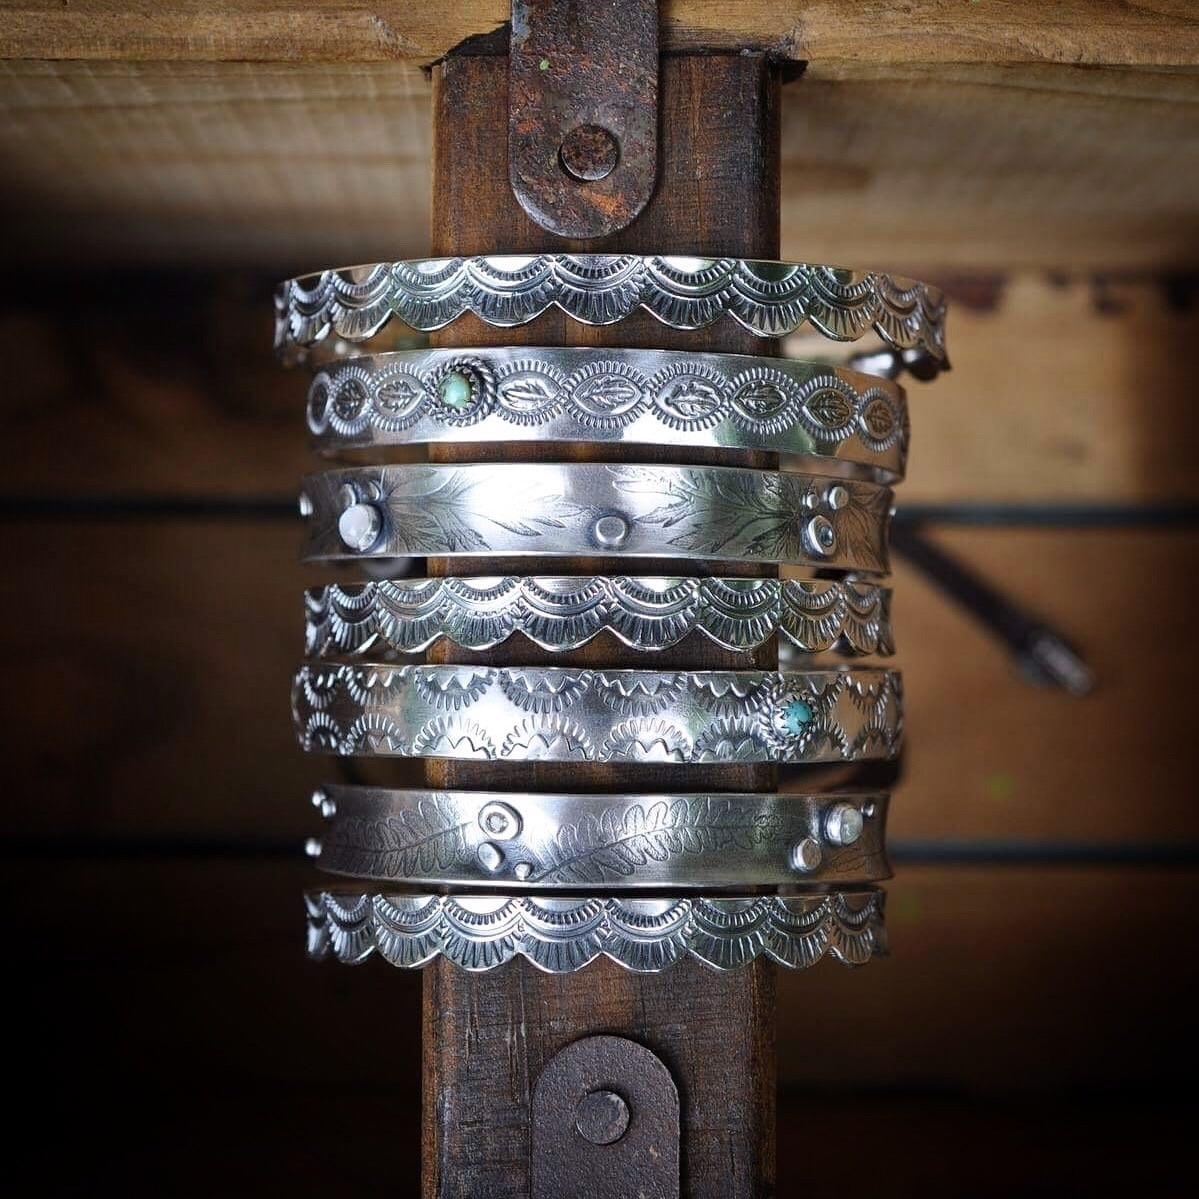 cuffs wraps shop update 8pm BST - christinewalshjewellery   ello